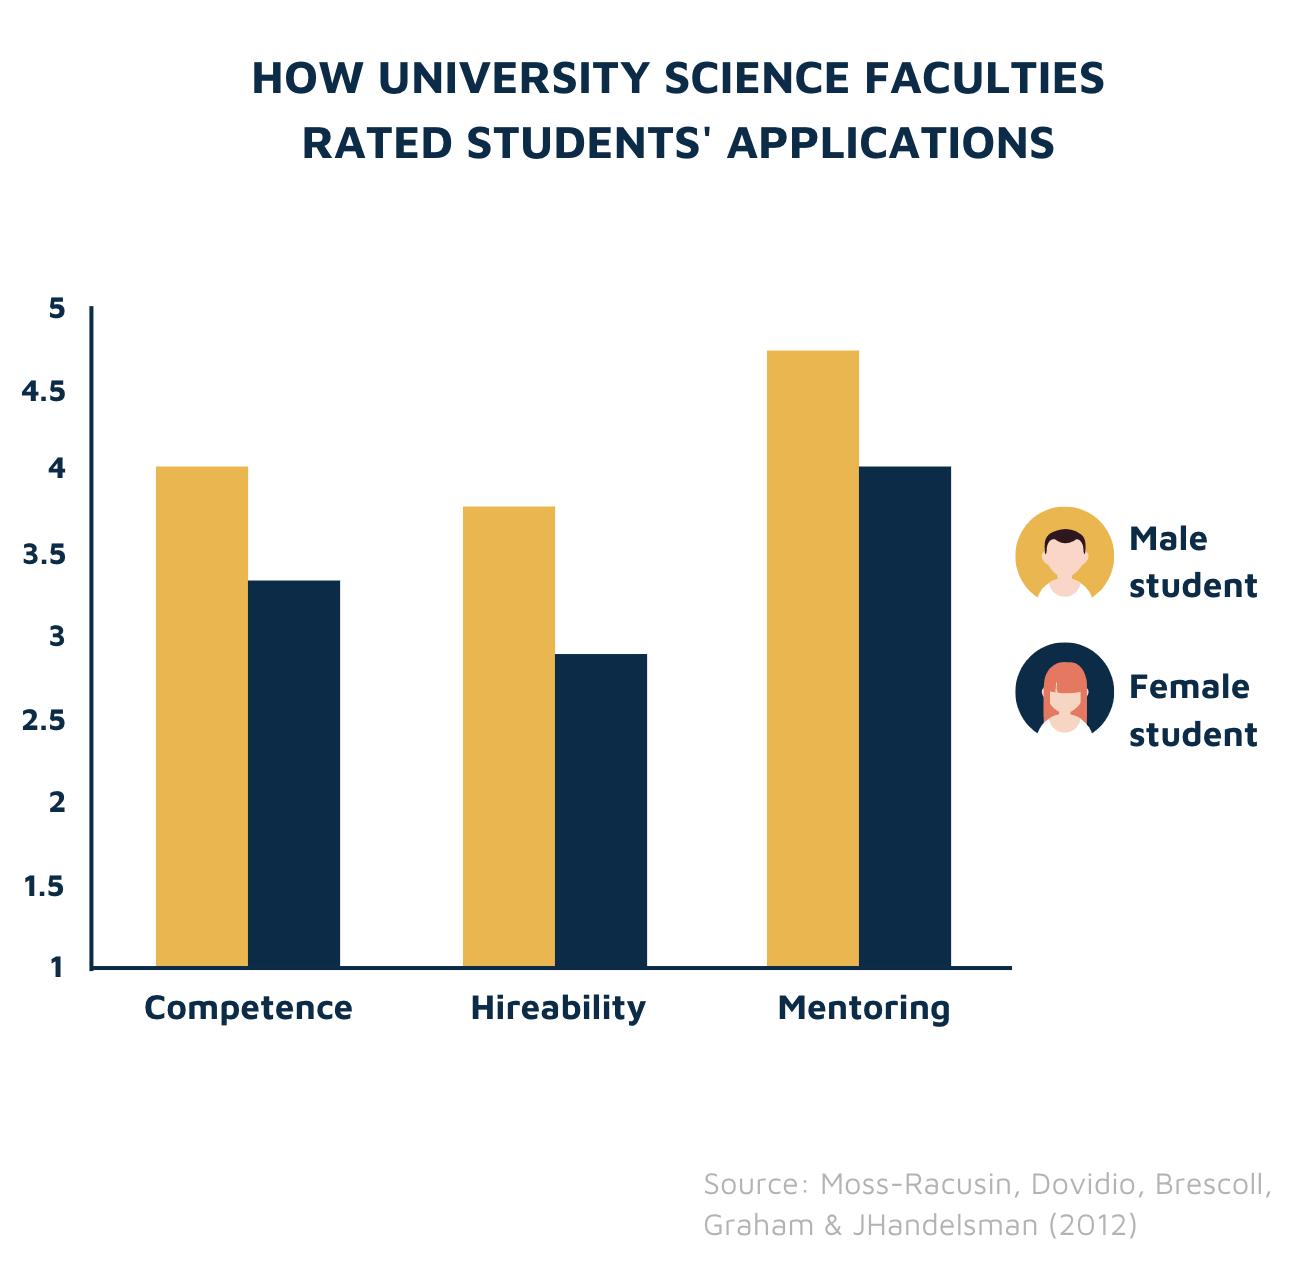 Science faculty ratings by gender